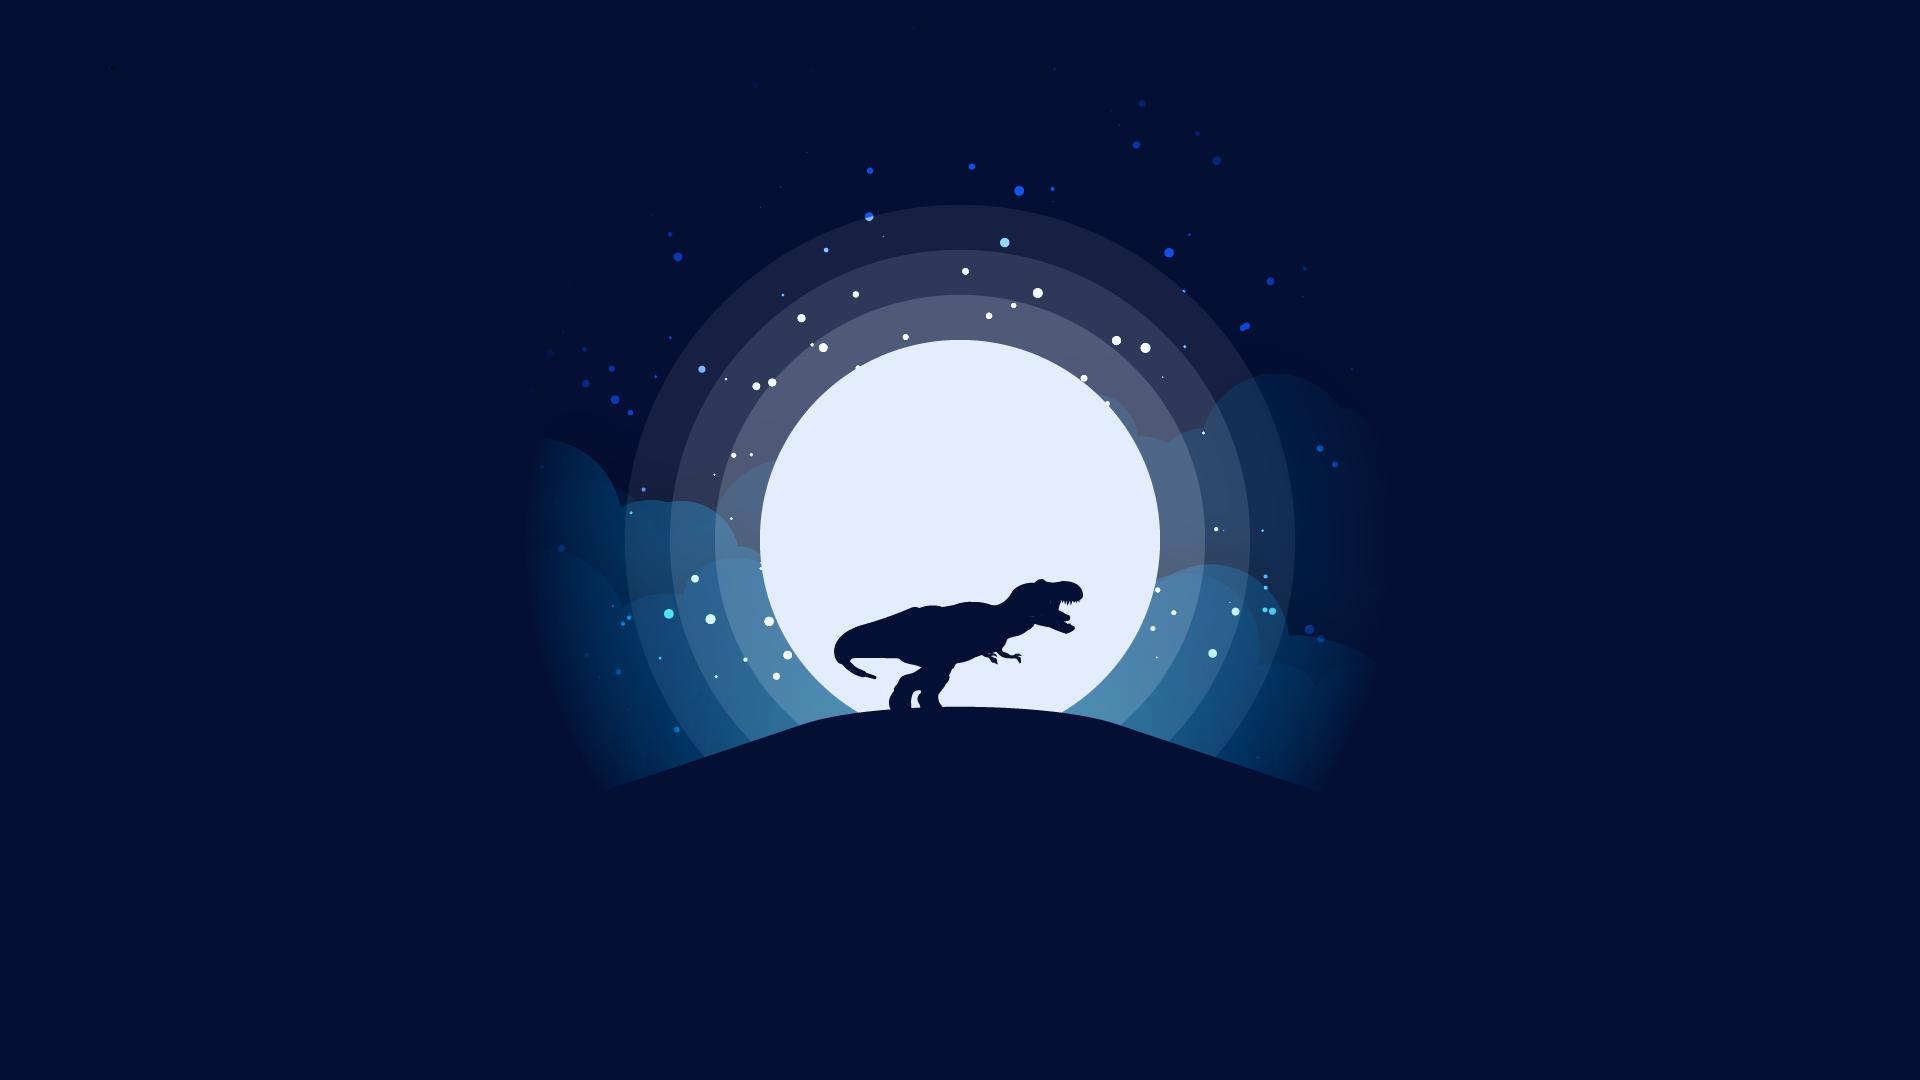 General 1920x1080 dinosaurs Luna simple background Tyrannosaurus rex